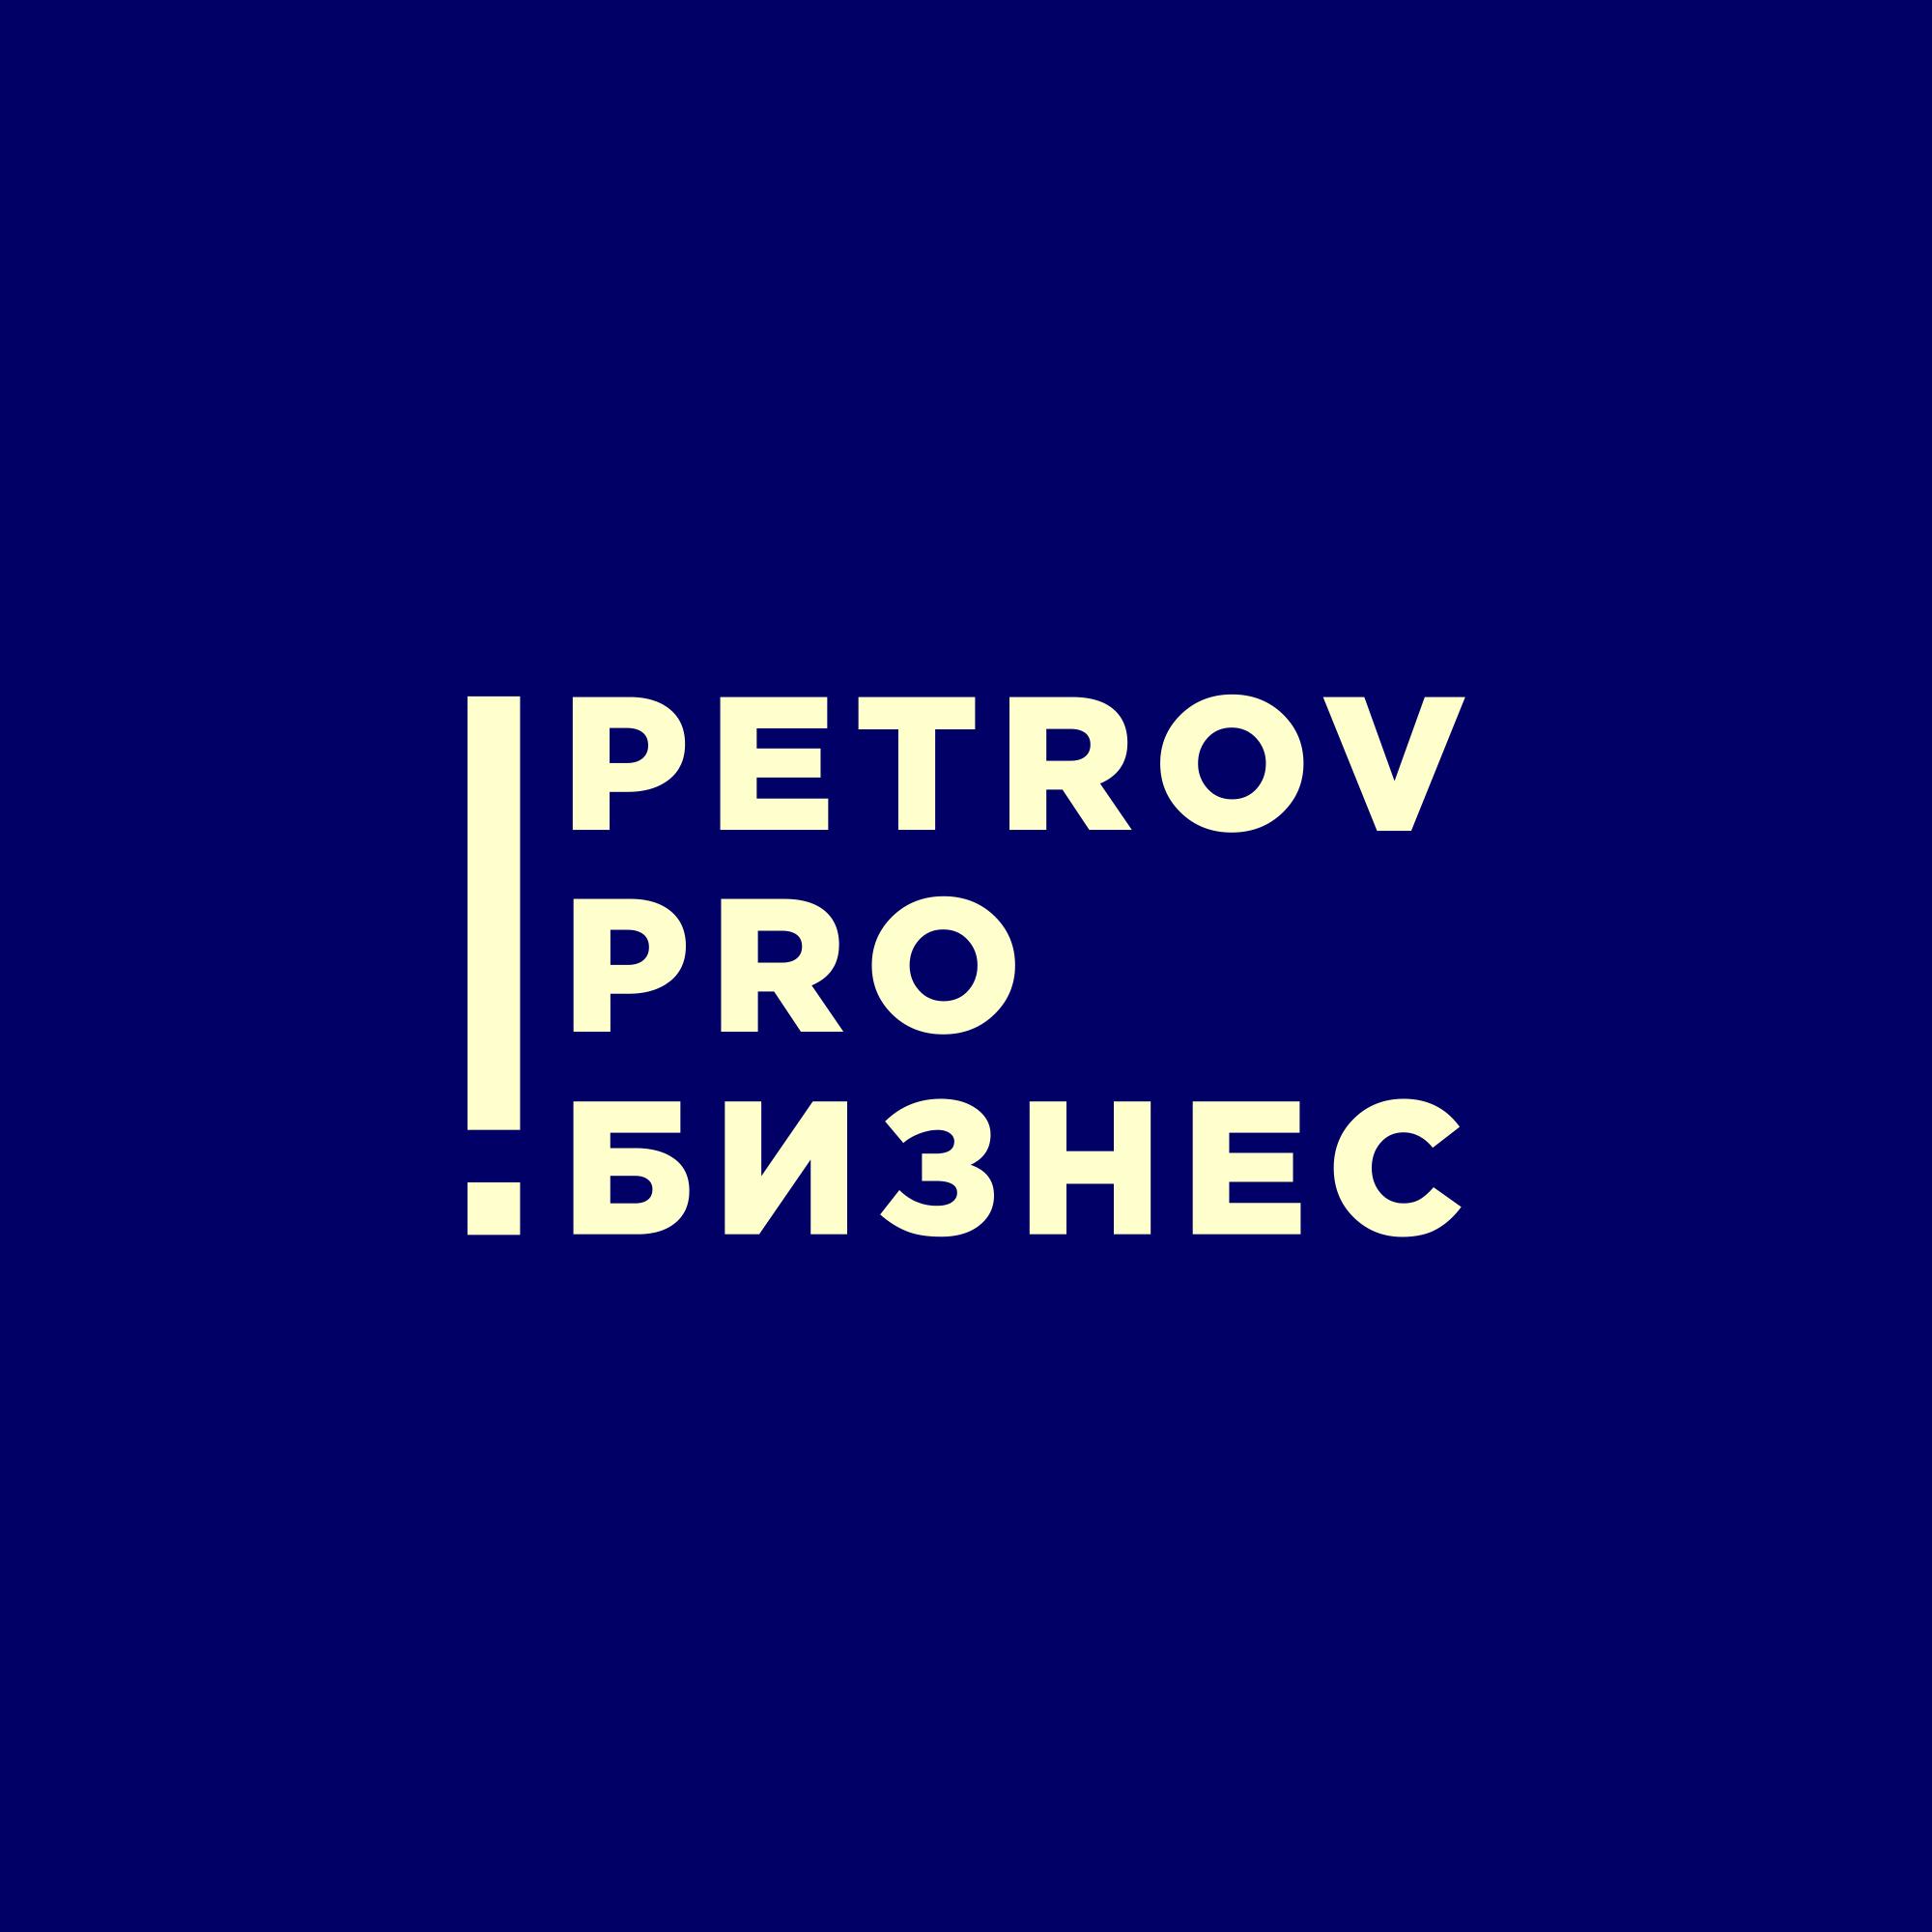 Создать логотип для YouTube канала  фото f_3565bfda820d42a4.jpg